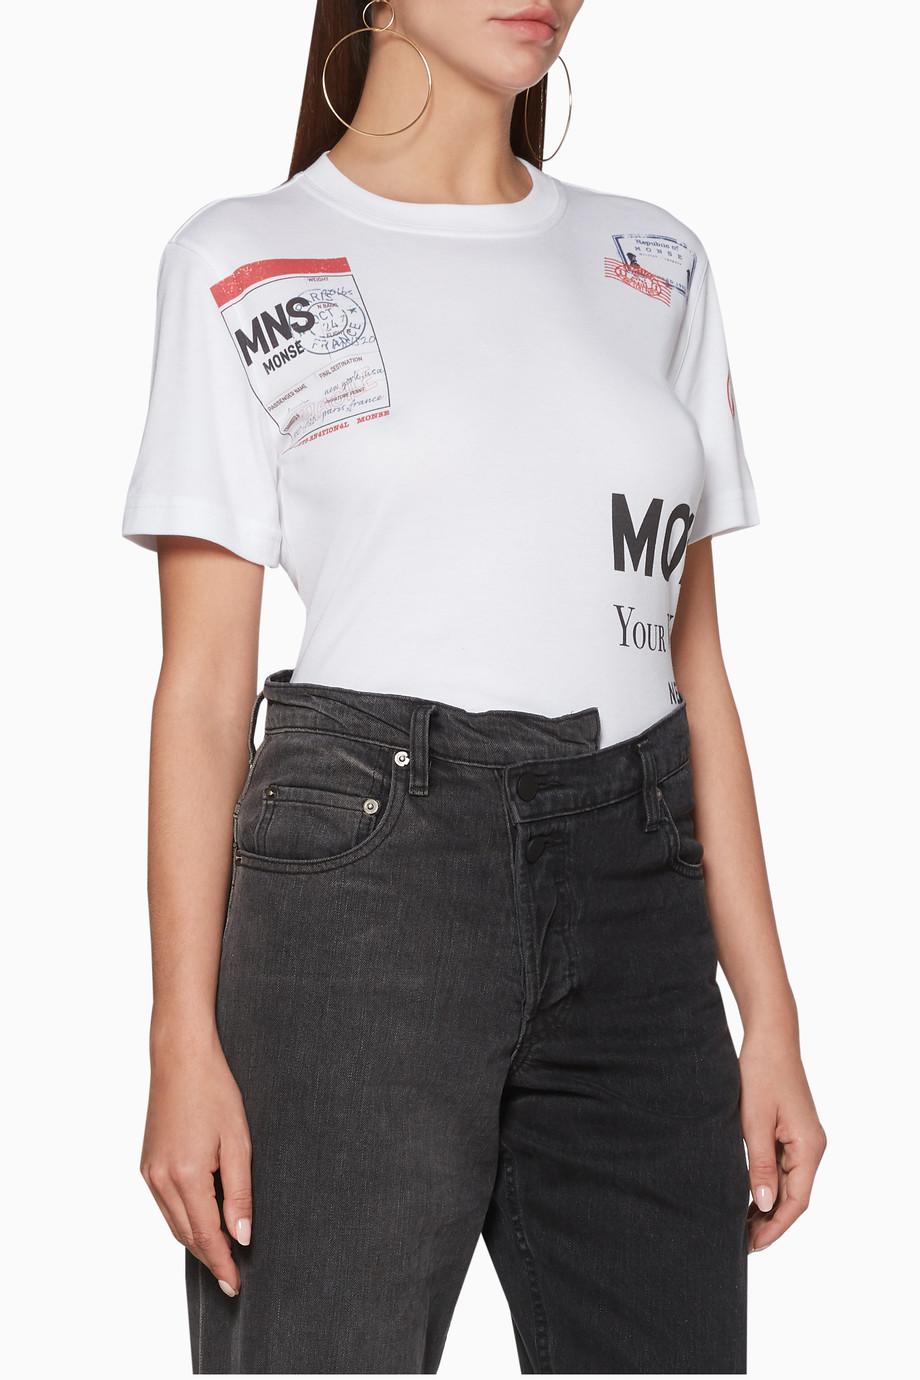 ac4a95053 Shop Monse White White Monse Stamp Short Sleeve T-Shirt for Women ...